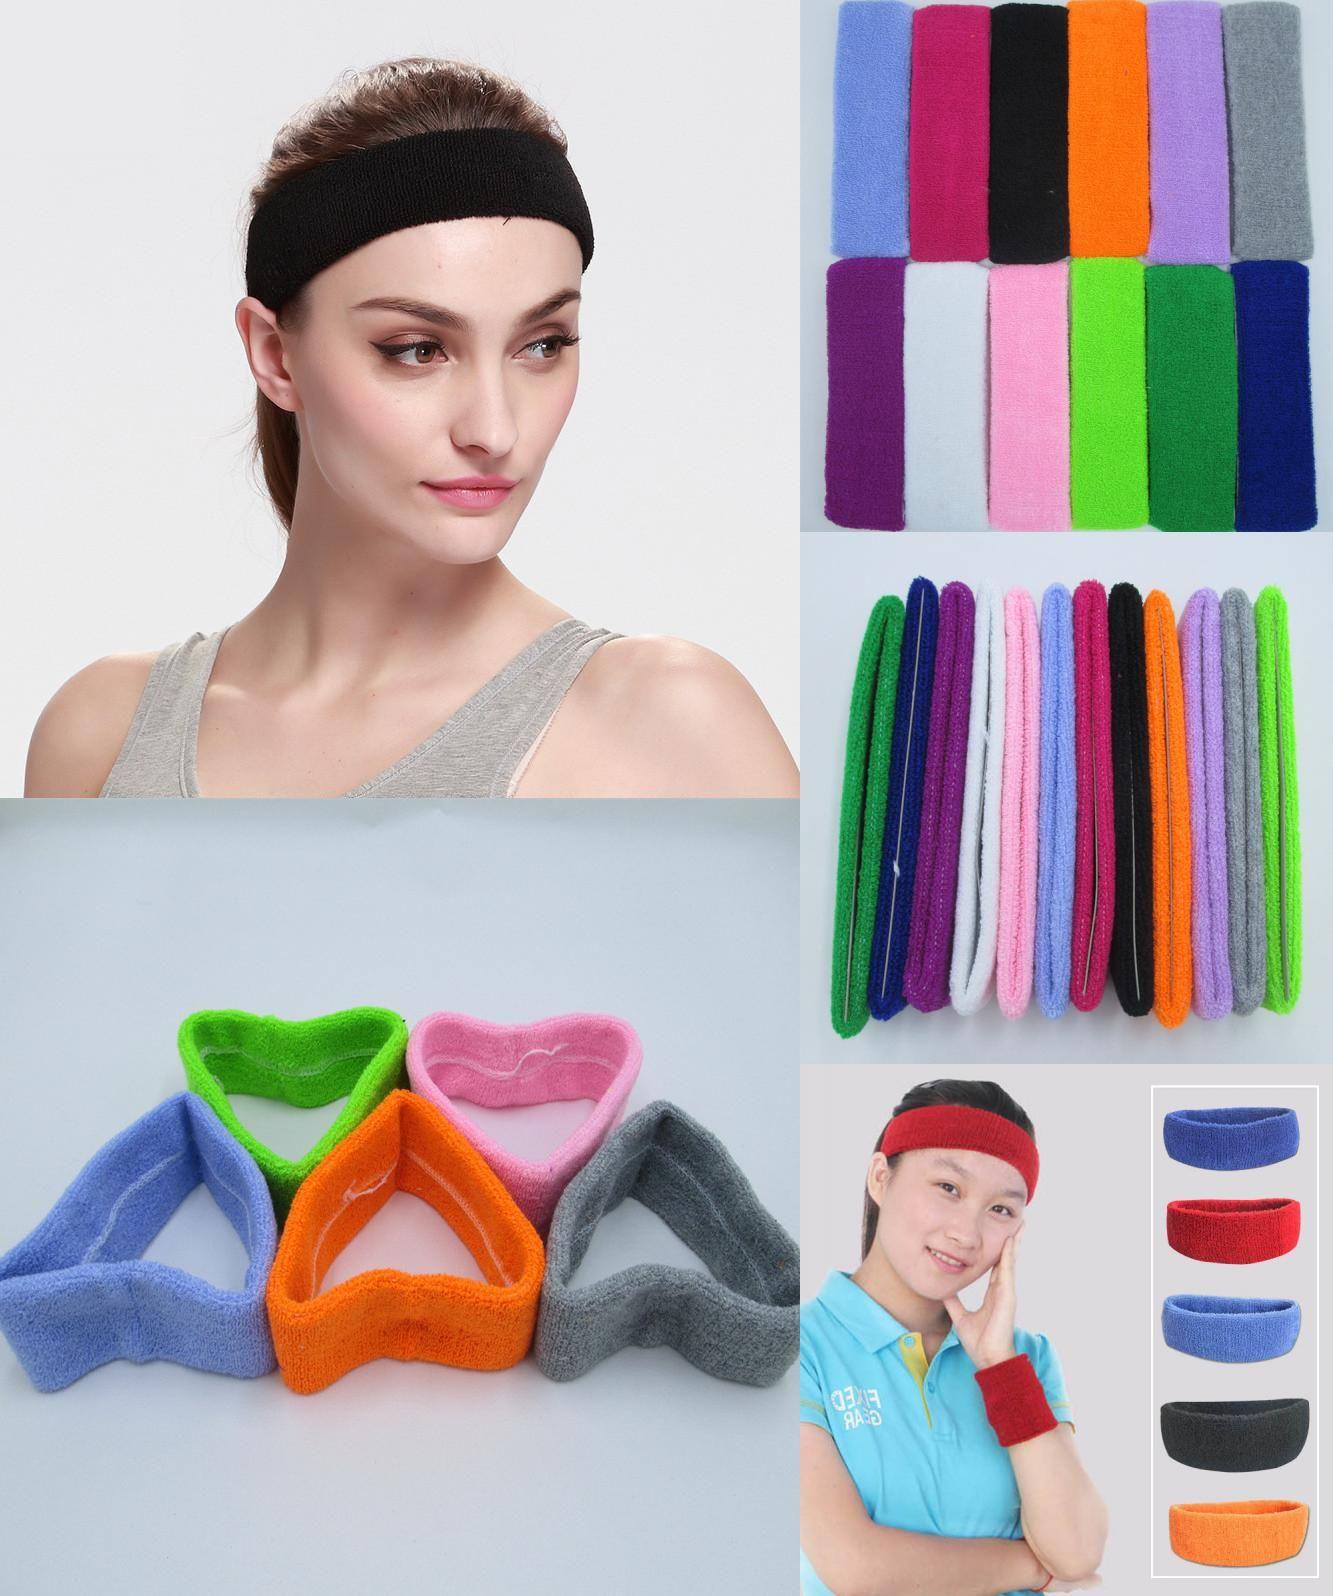 Visit To Buy 100 Cotton Thick Tower Sports Headband Tennis Badminton Basketball Sweatband Head Sweat Band Basketbal Sports Headbands Yoga Headband Sweatband